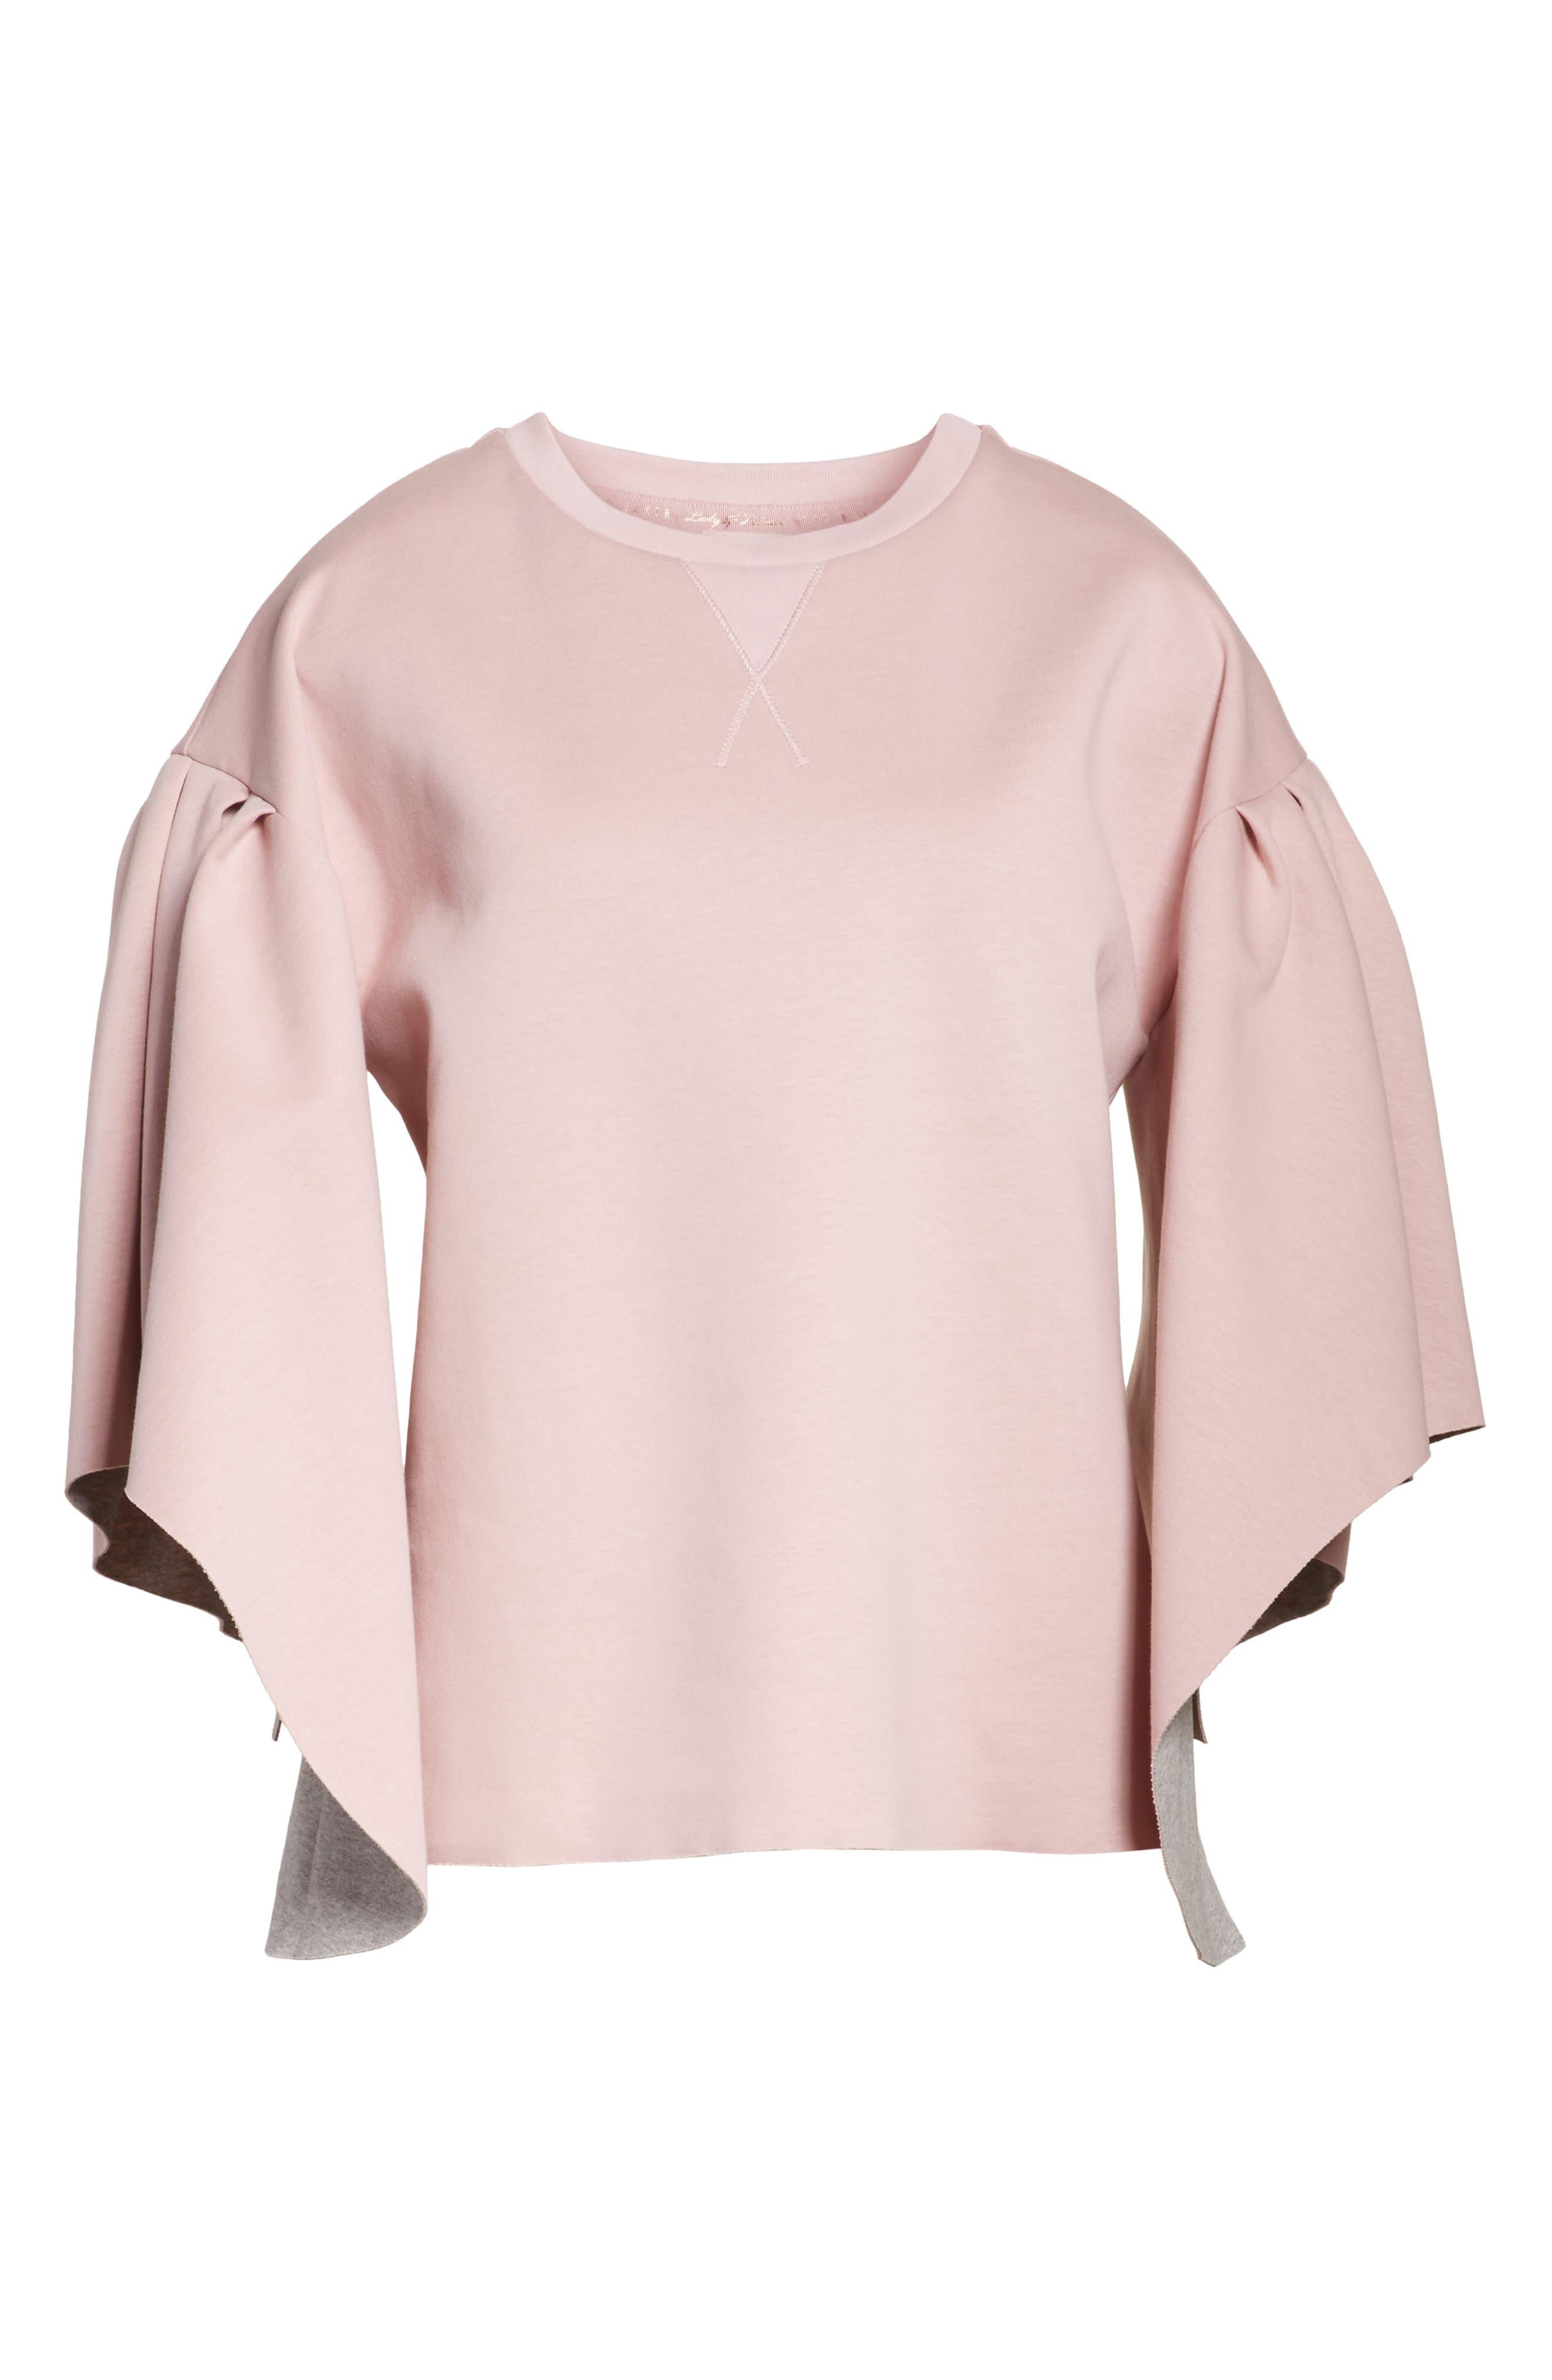 Orcher Full Sleeve Sweatshirt,                             Alternate thumbnail 18, color,